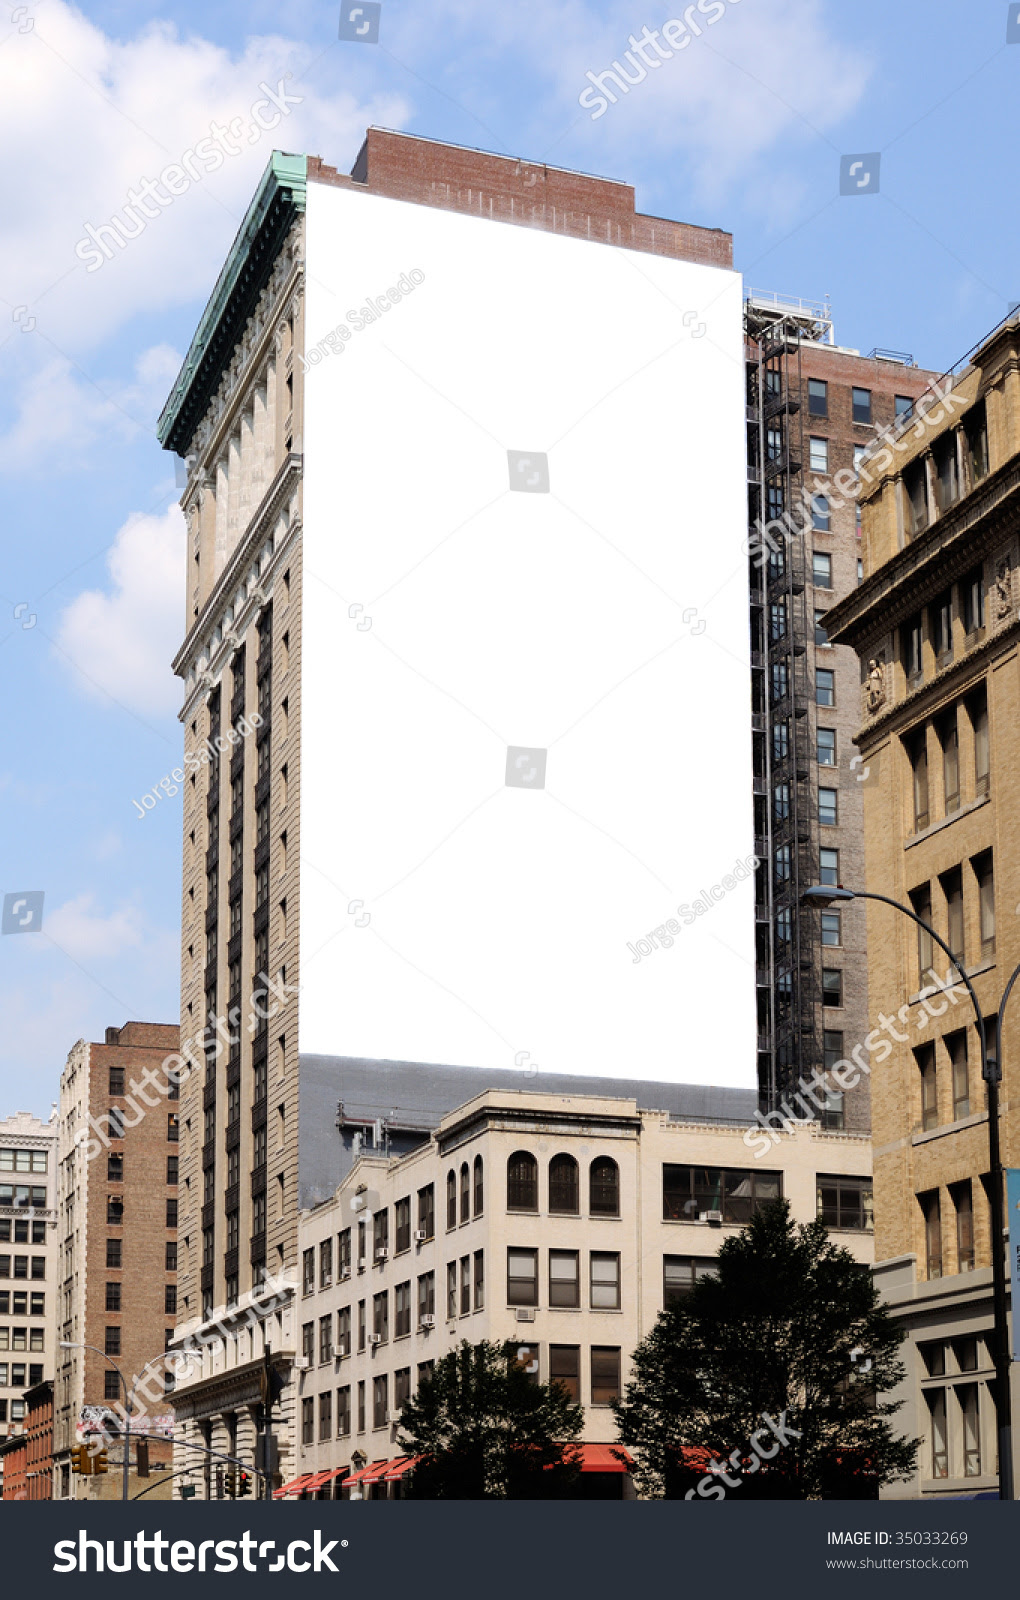 Large Billboard New York City Stock Photo 35033269 - Shutterstock